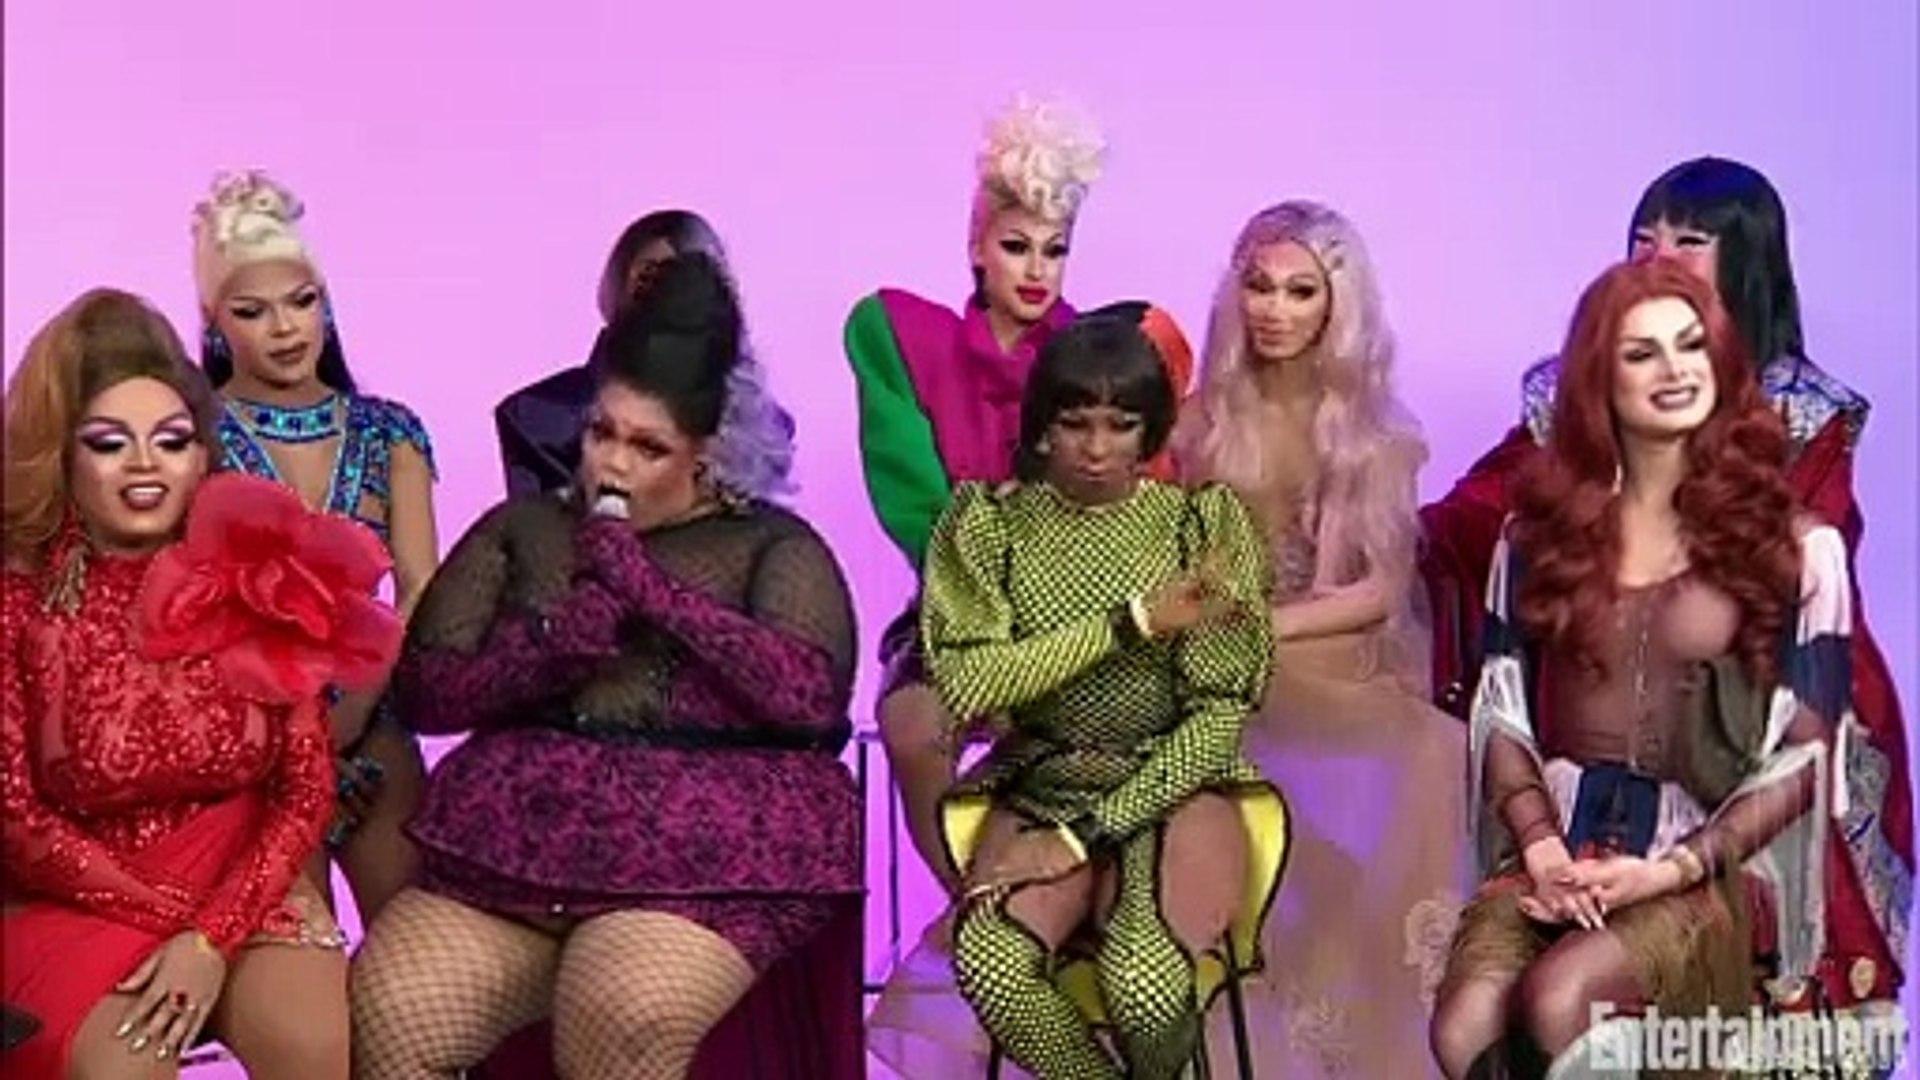 'RuPaul's Drag Race' Season 11 Cast Talk Representation On Upcoming Season   Entertai